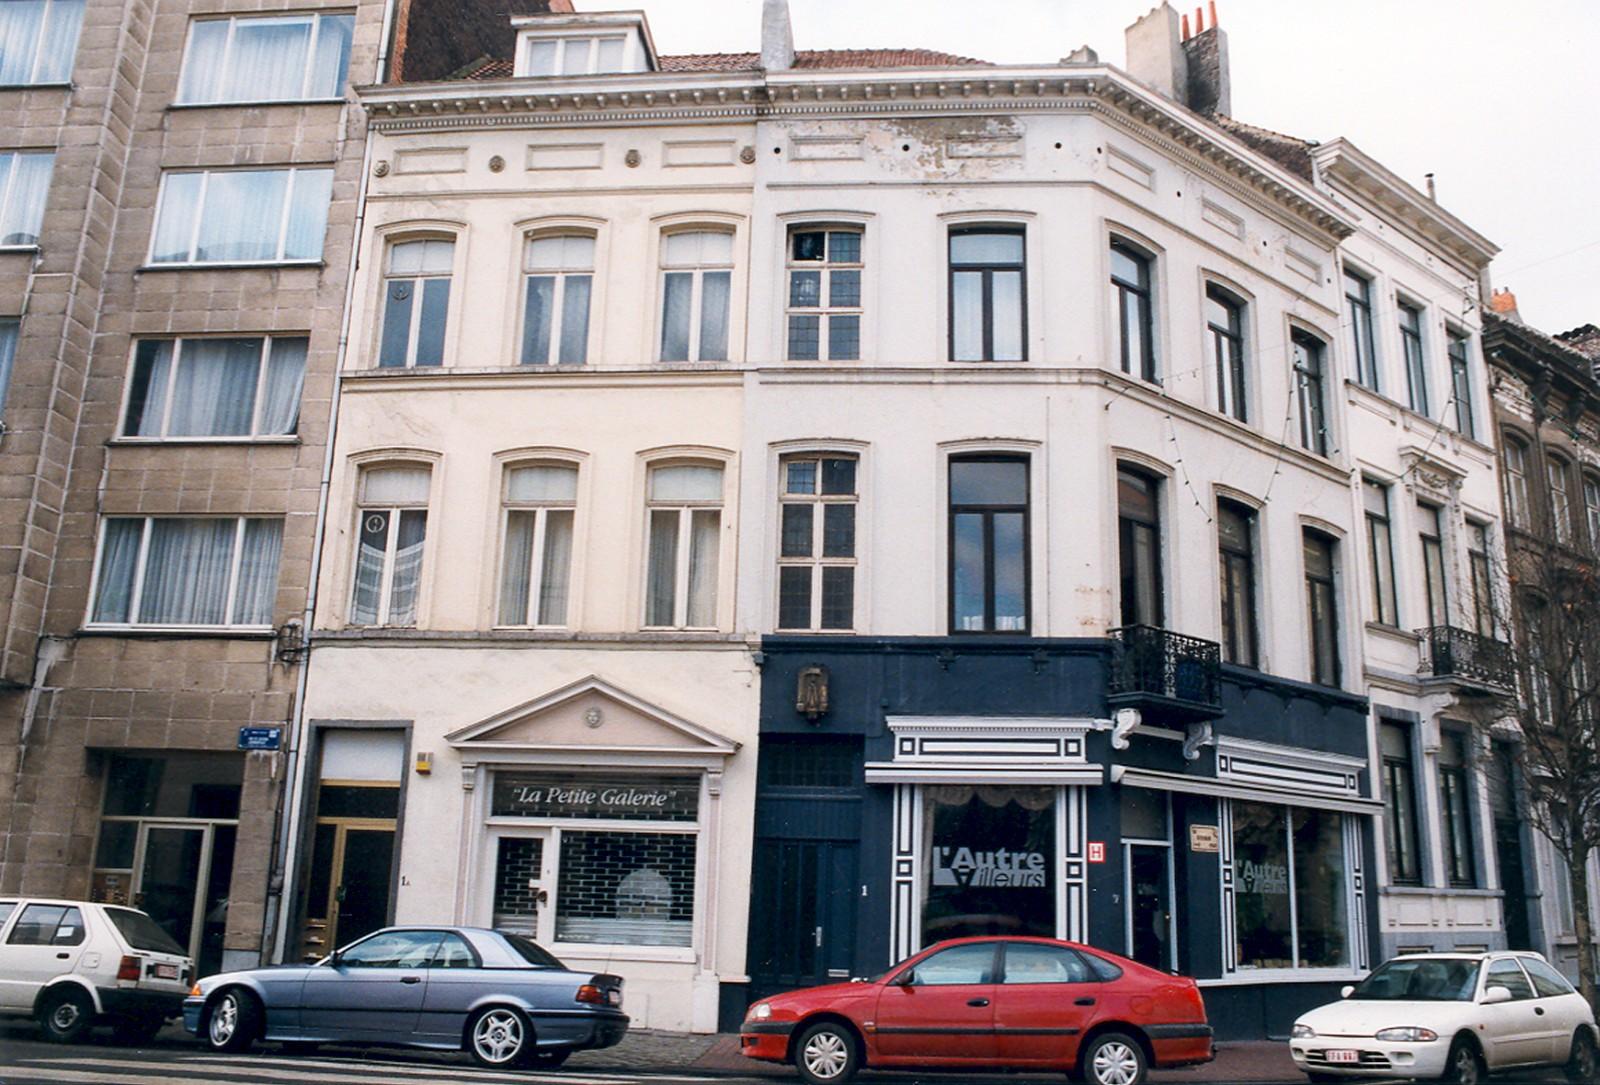 Rue de Livourne 1-1a et rue Berckmans 2., 1999